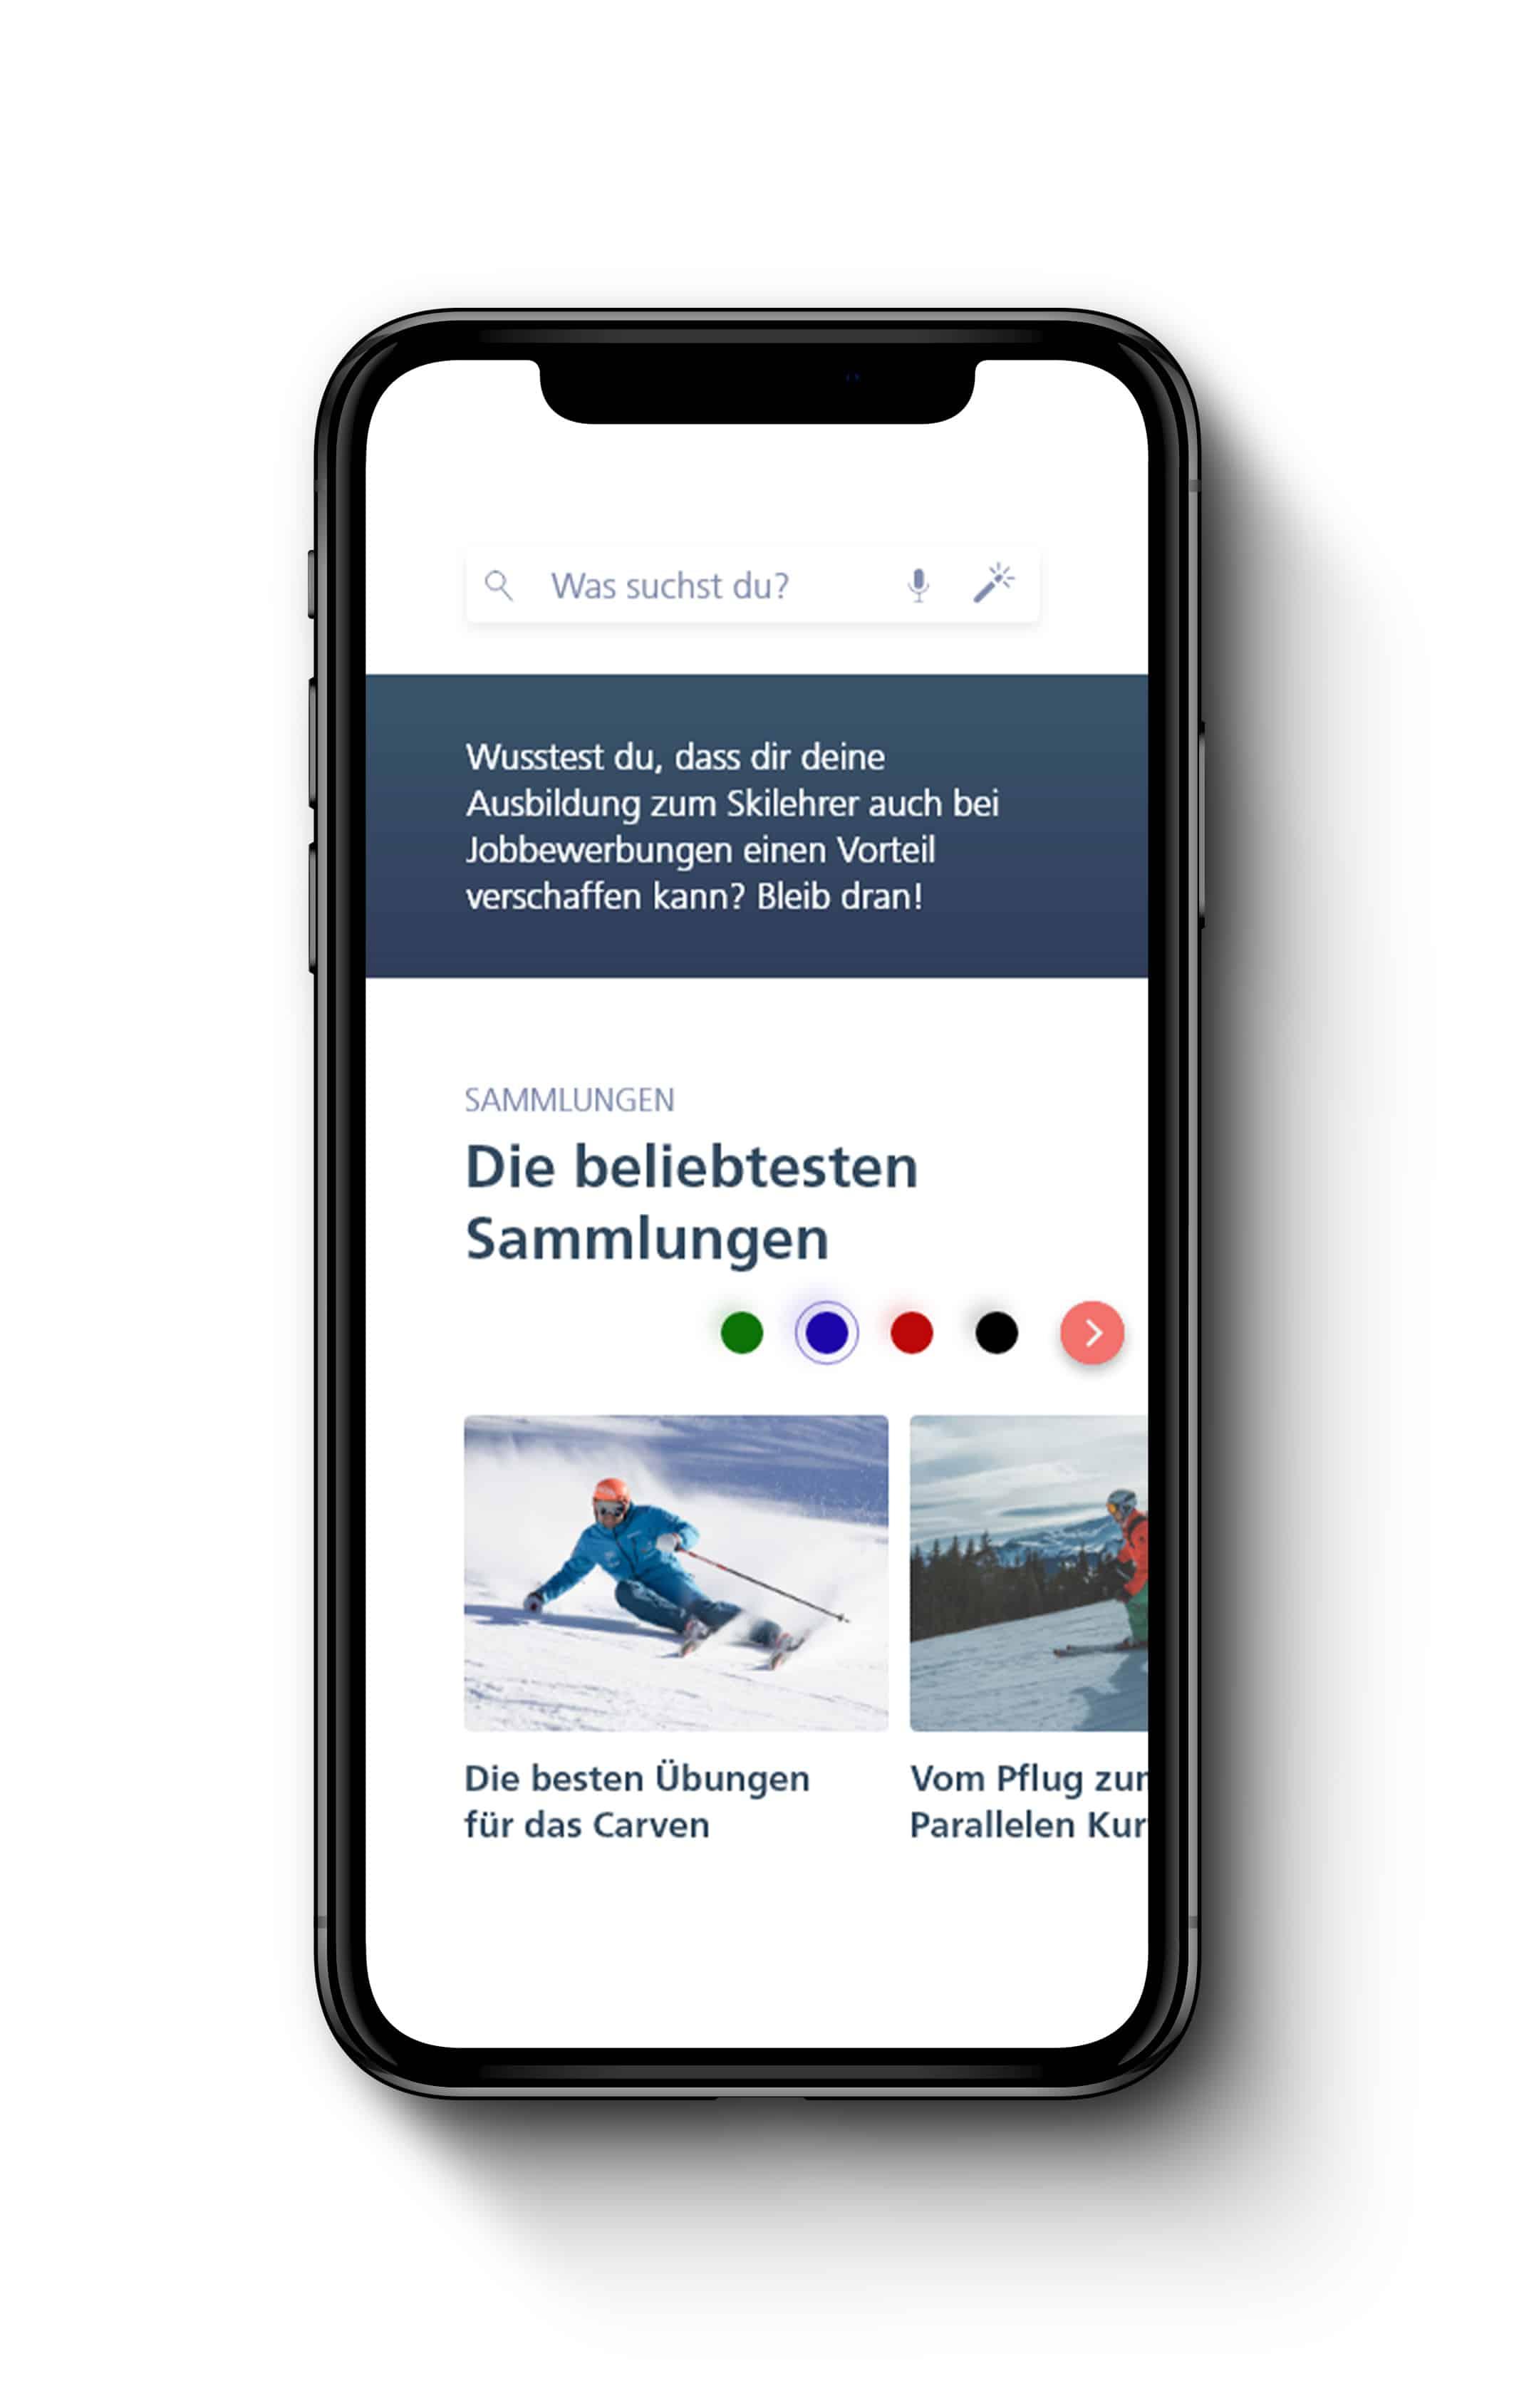 moritz-hamberger_slackline-skifahren-design_moritz hamberger skeacher home_moritz-hamberger_skeacher_home